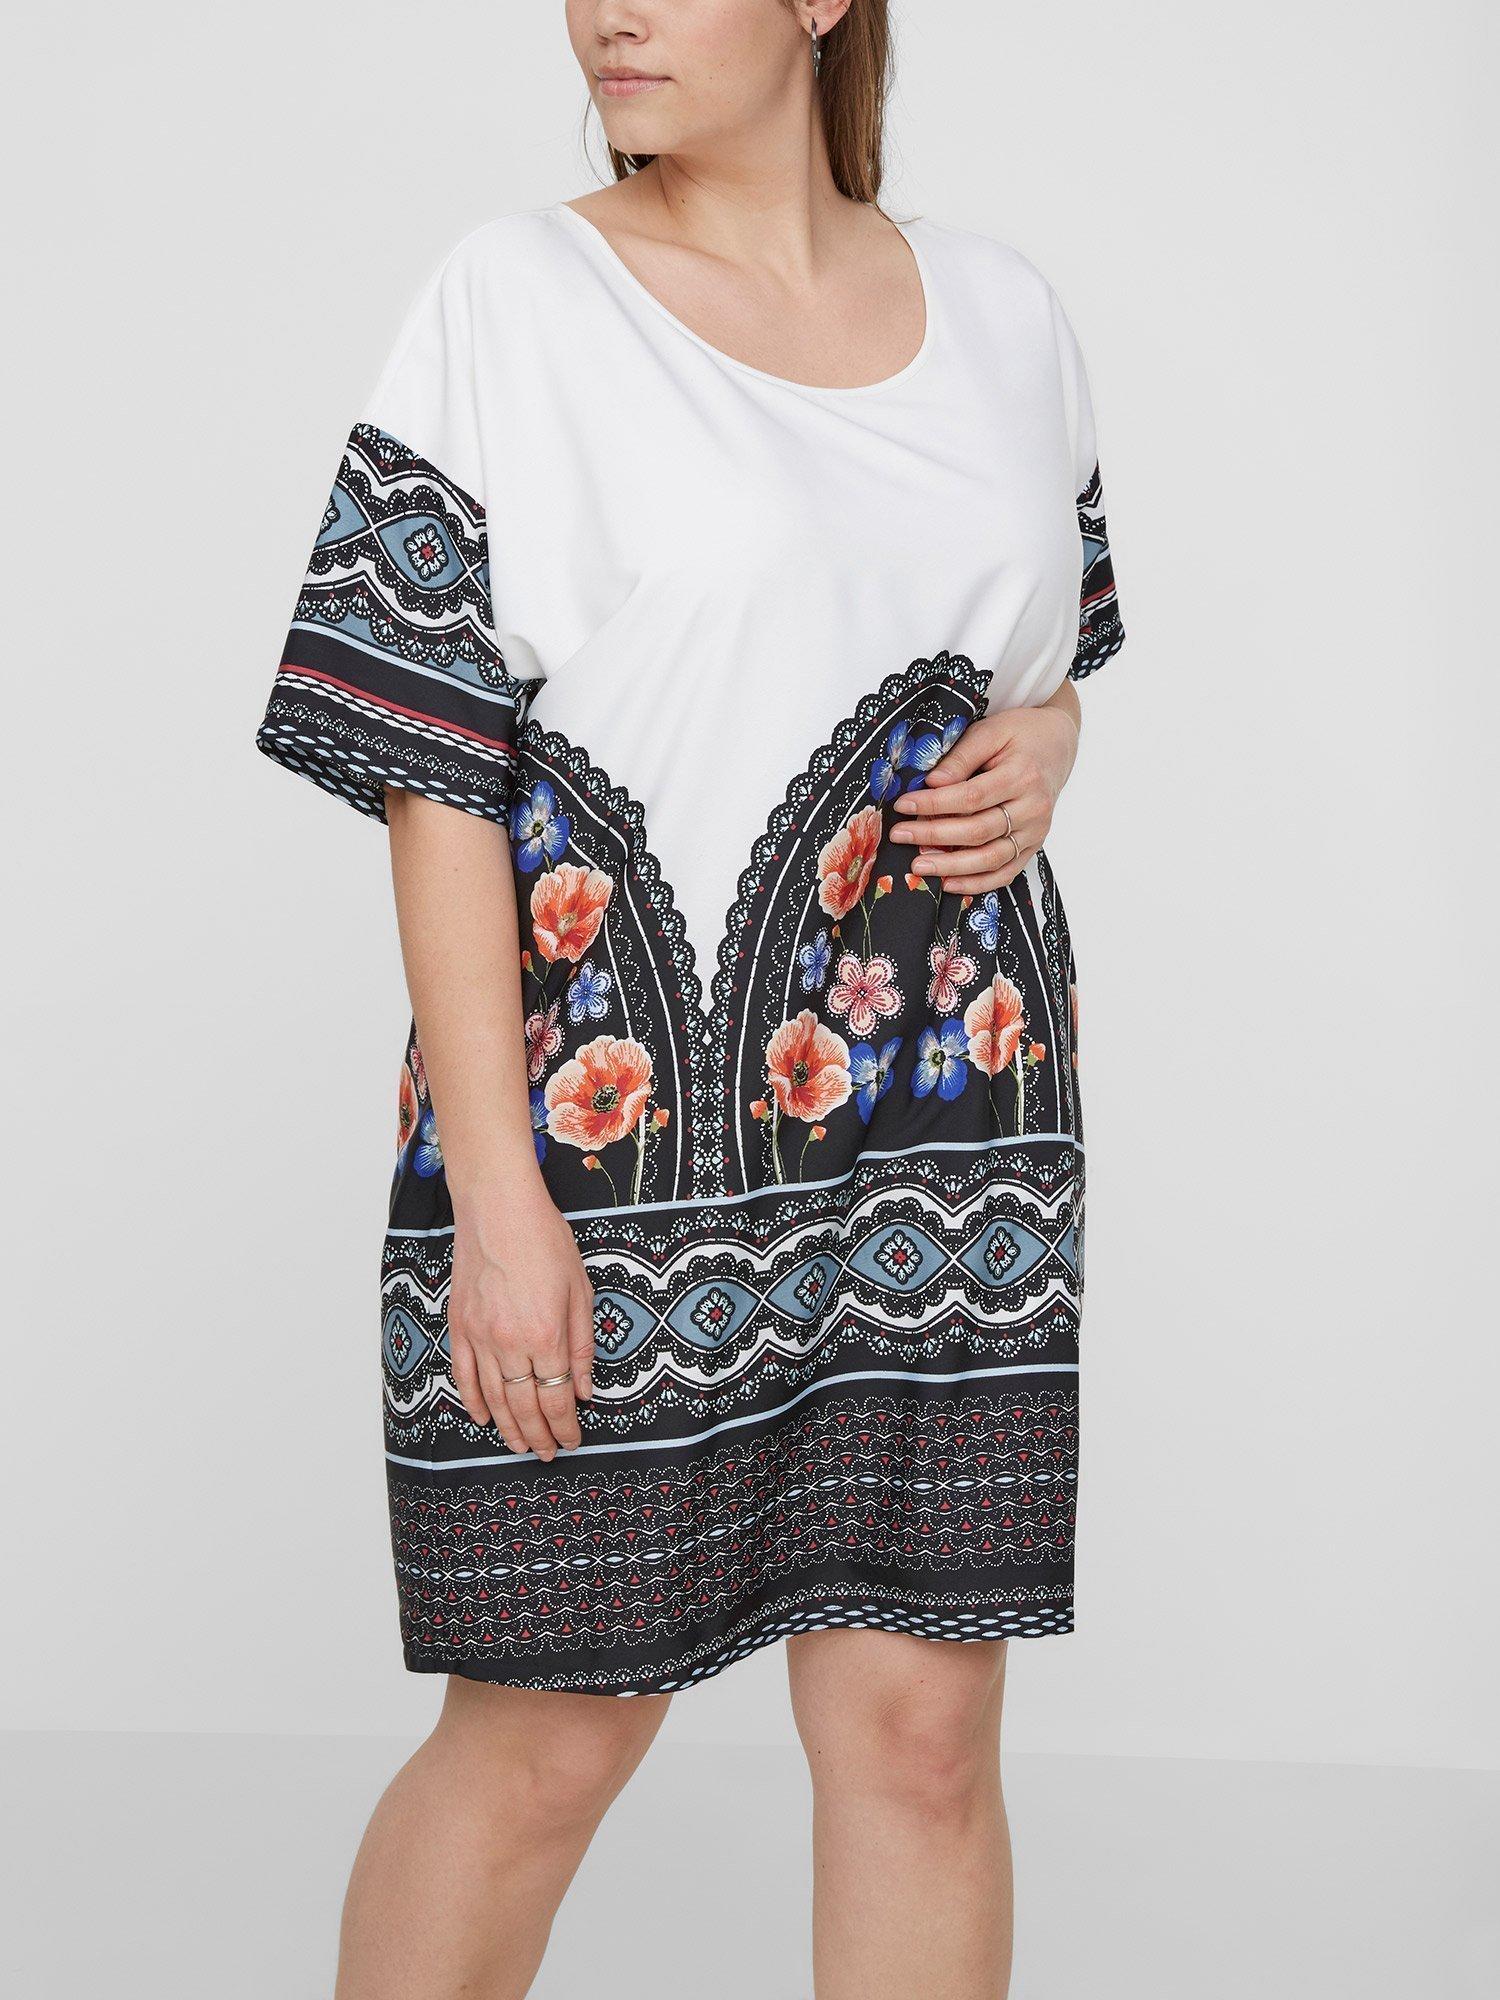 Hvid kjole med flot retroprint